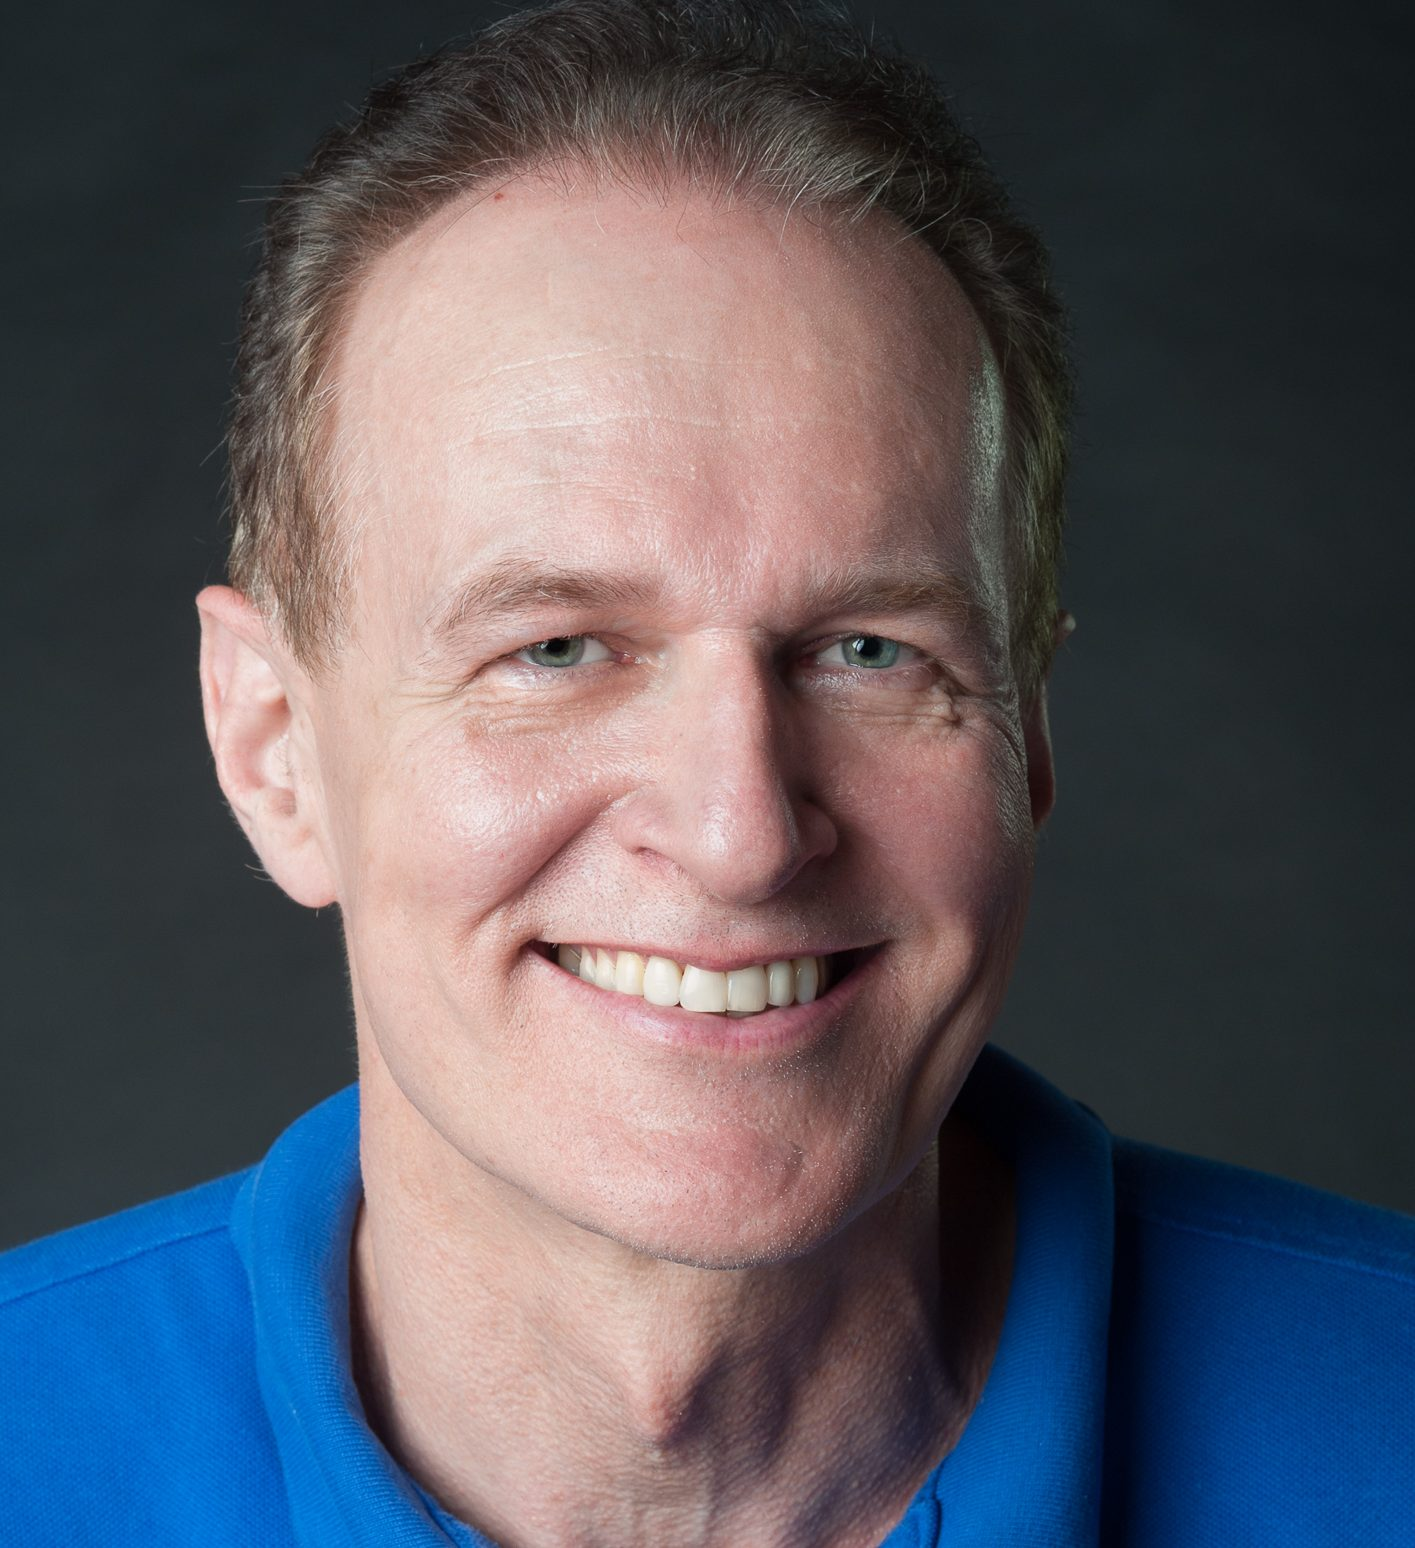 Dr. Ruud Valks, dermatogie